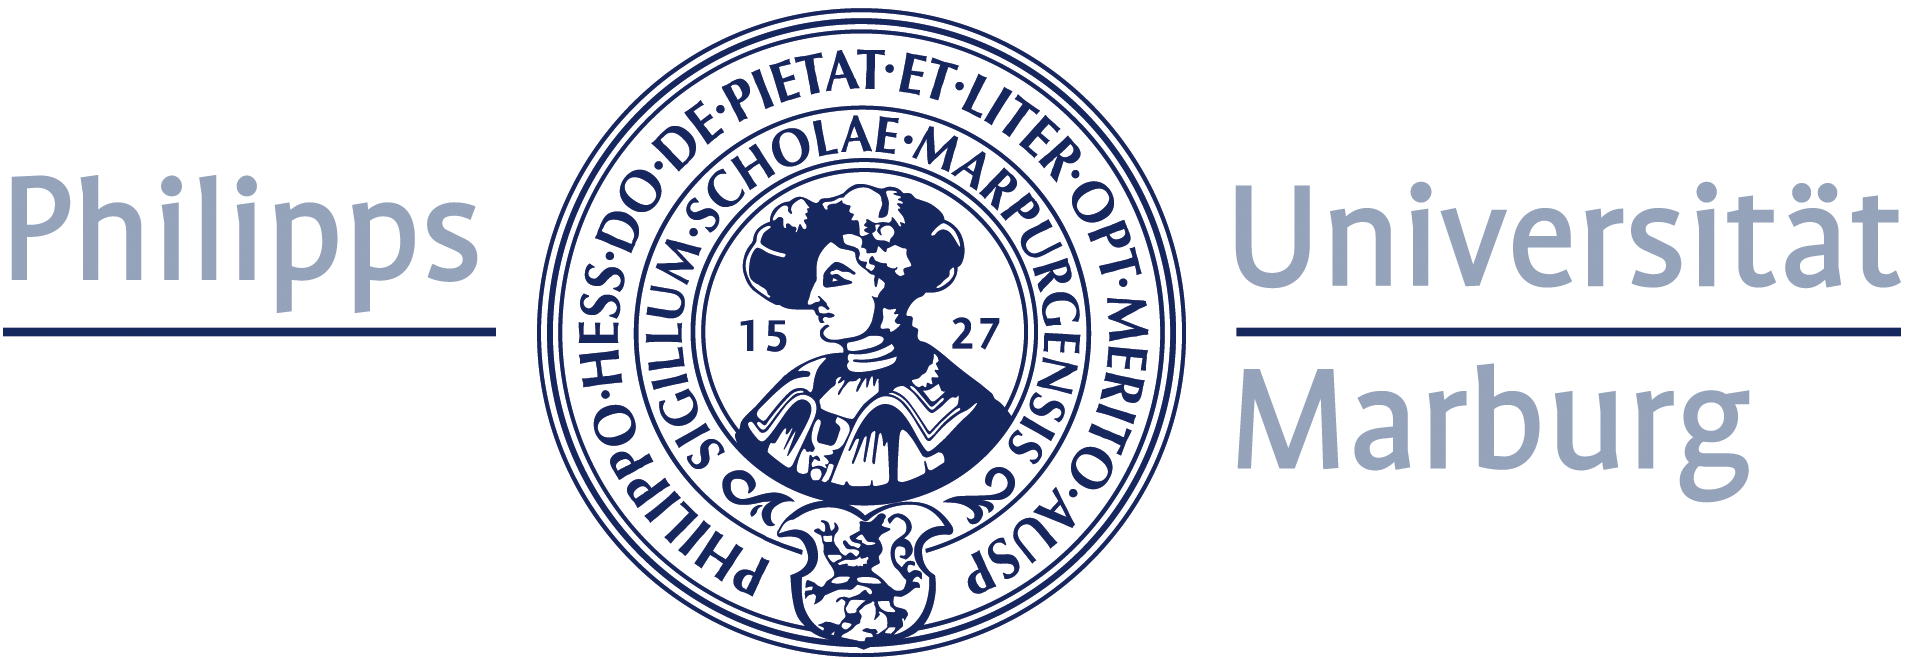 stud. Hilfskraft - Robotikum Marburg-Biedenkopf (m/w/d) - Philipps-Universität Marburg - Logo